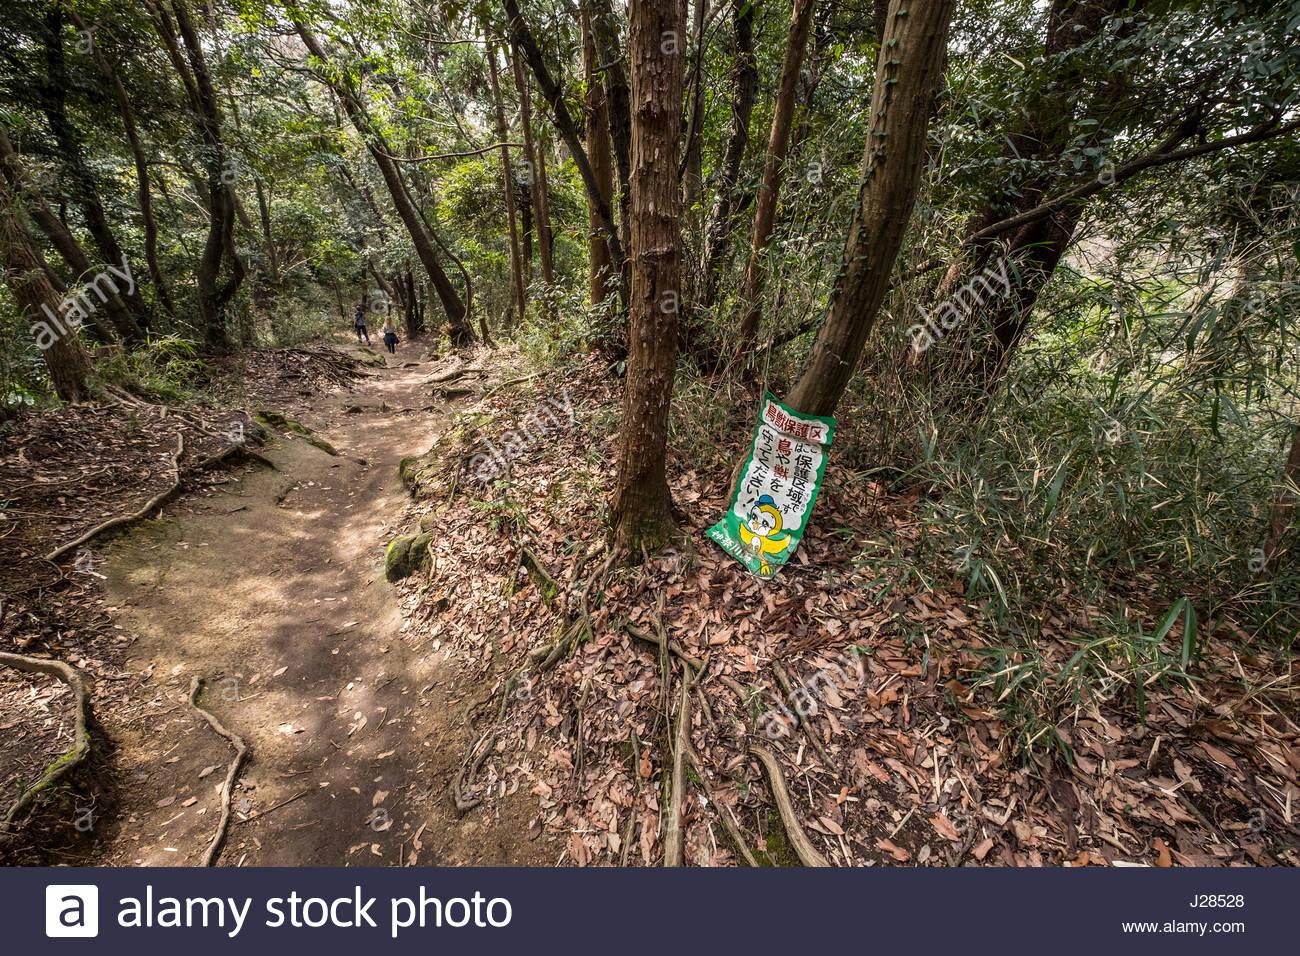 The Daibutsu Hiking Trail, Kamakura, Kanagawa Prefecture, Honshu, Japan - Stock Image